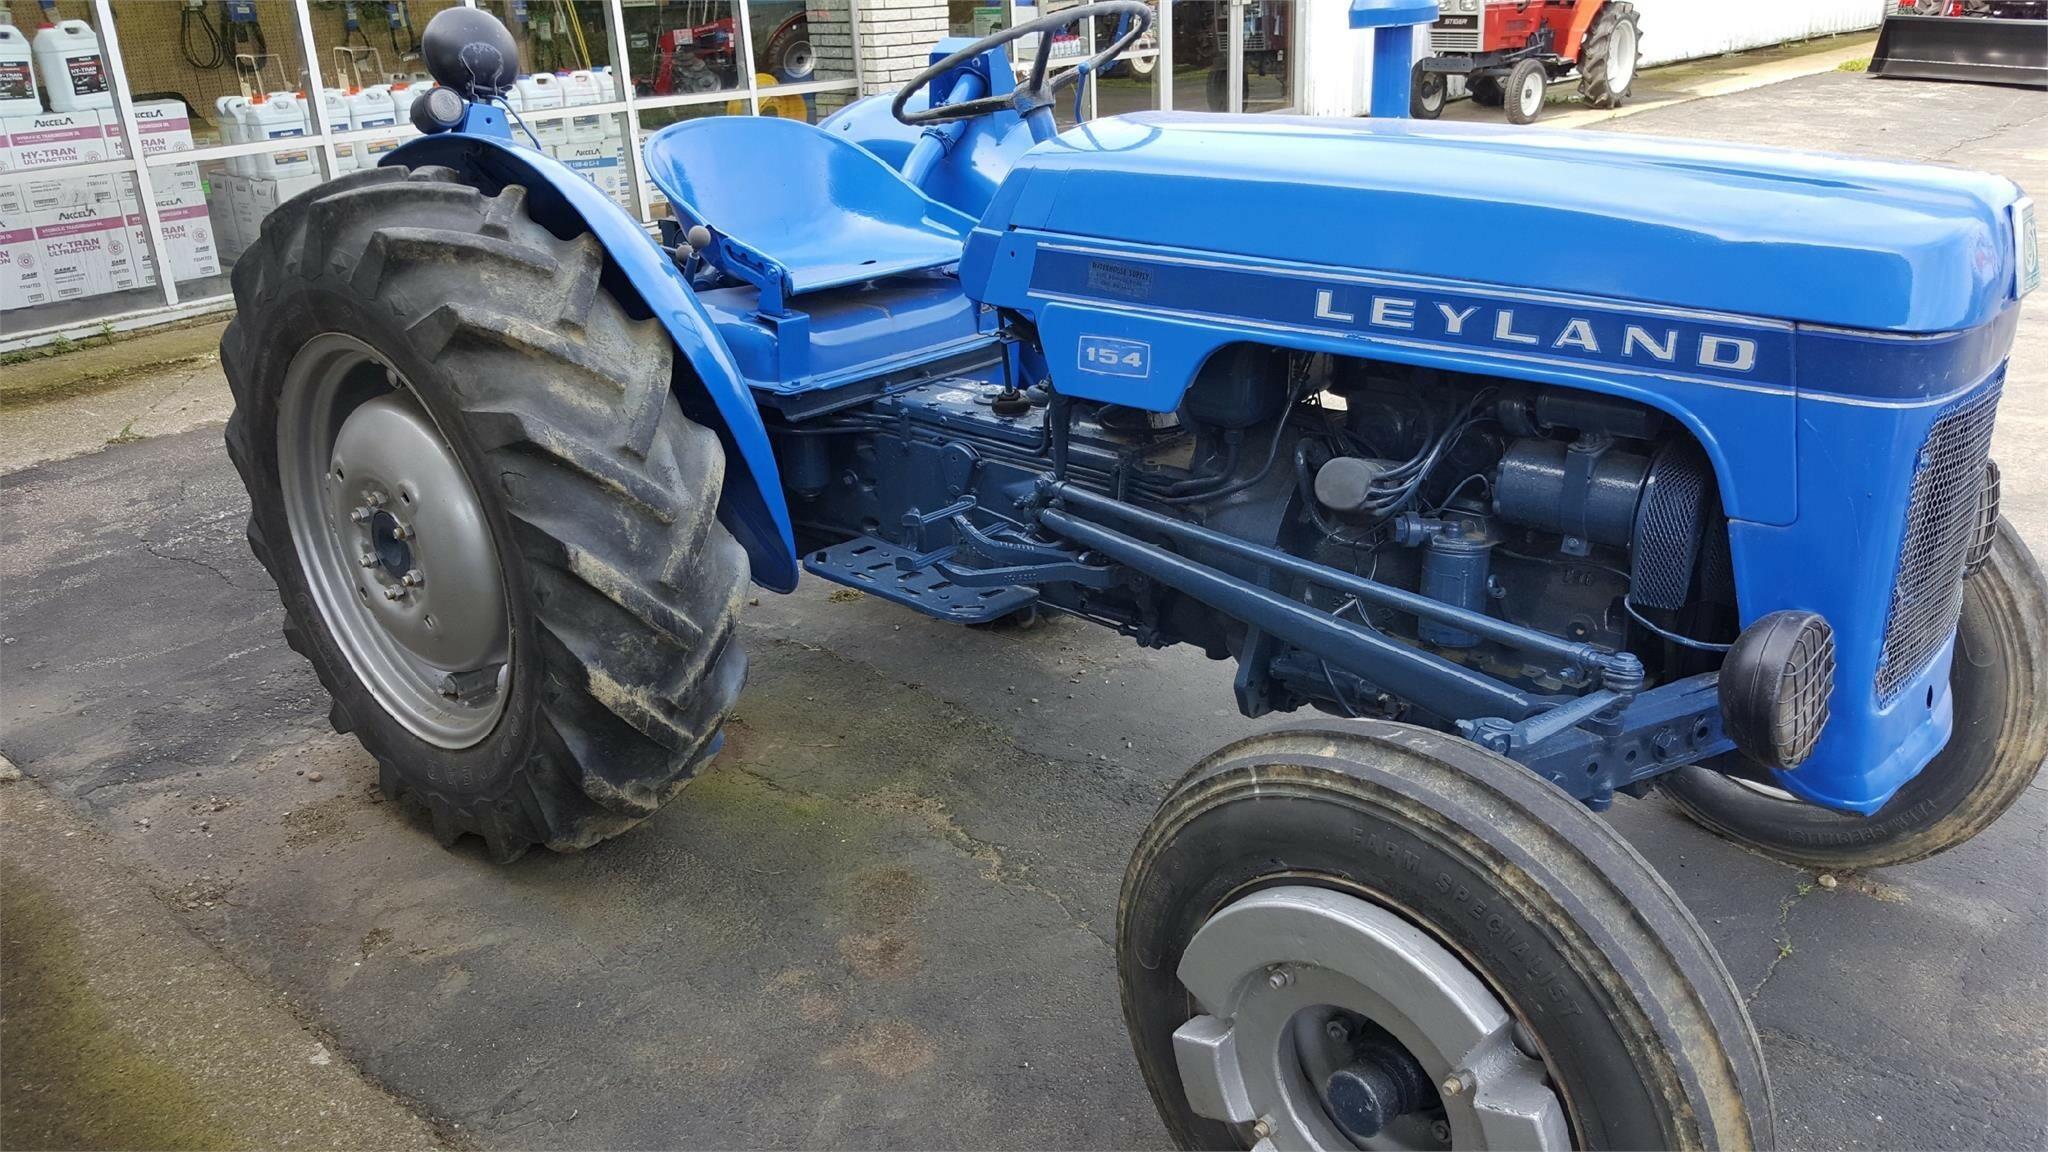 Leyland 154 Tractor